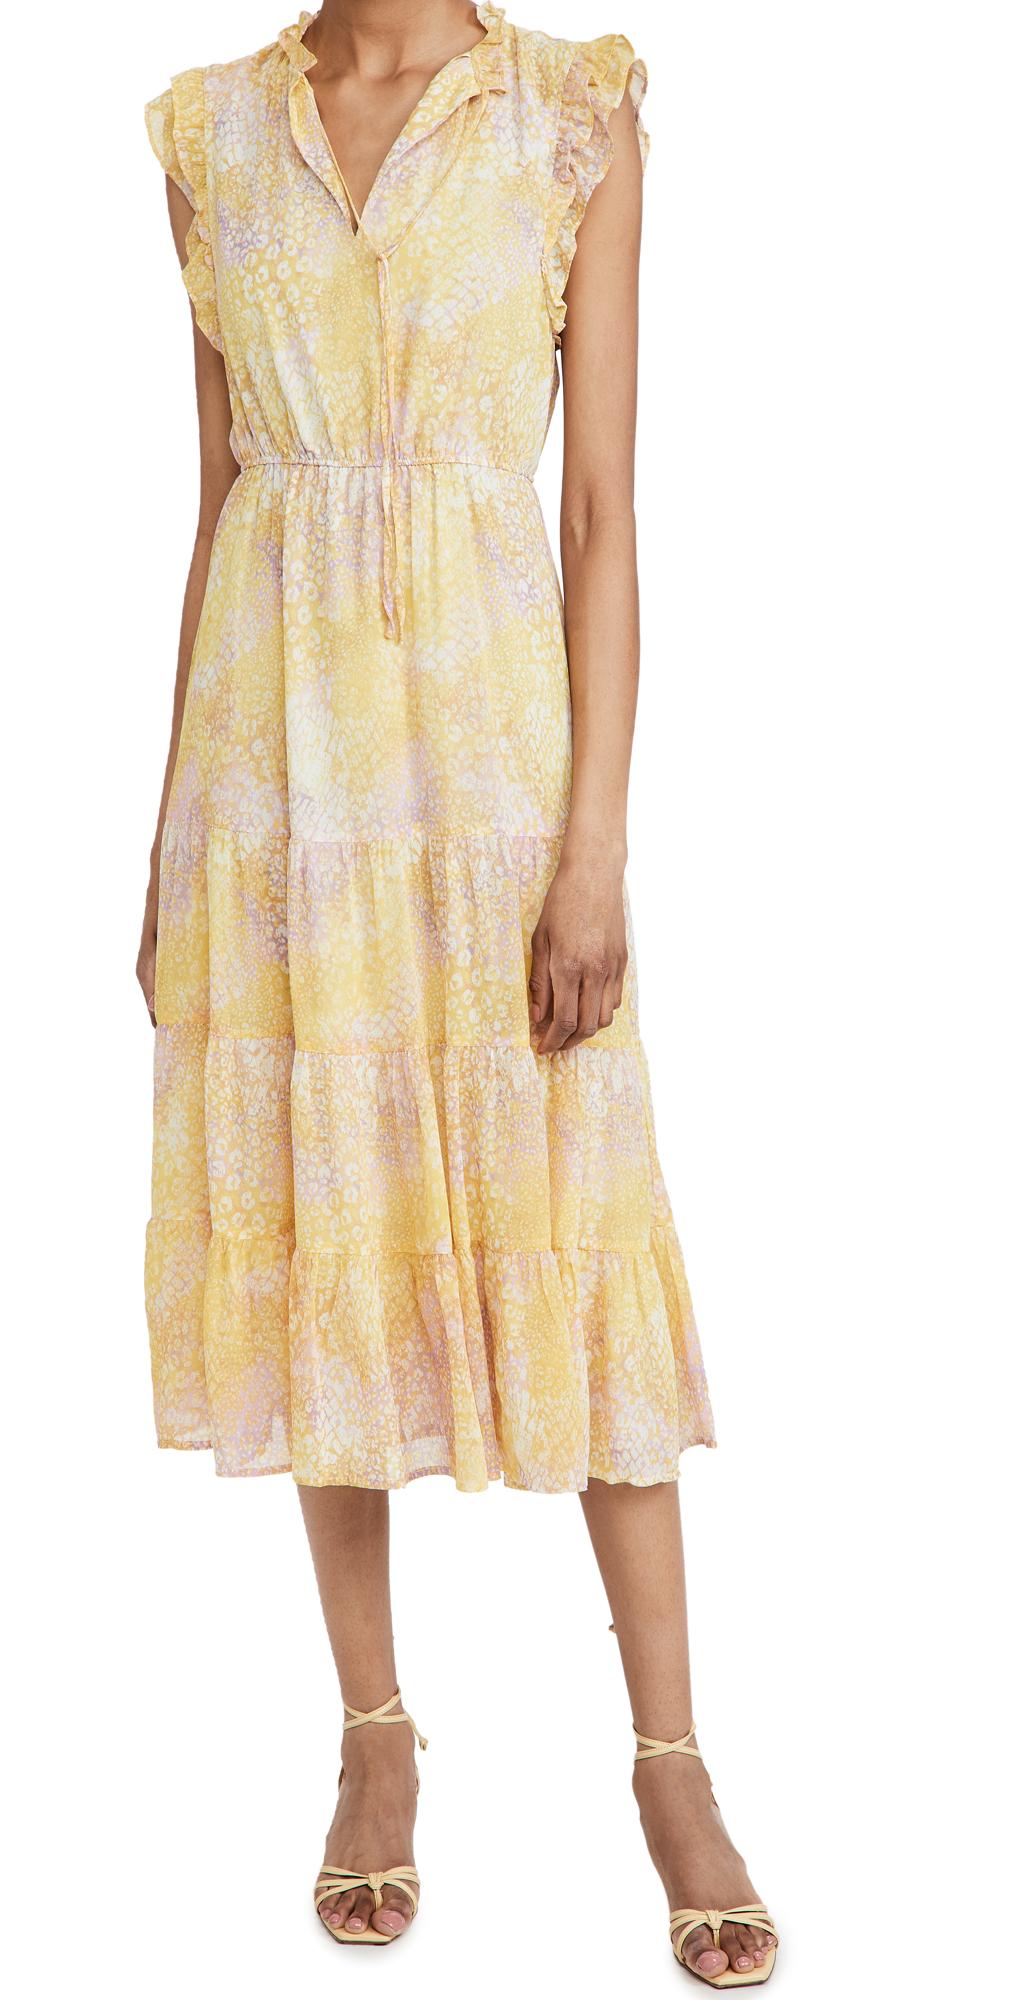 Bb Dakota DREAM GIRL DRESS